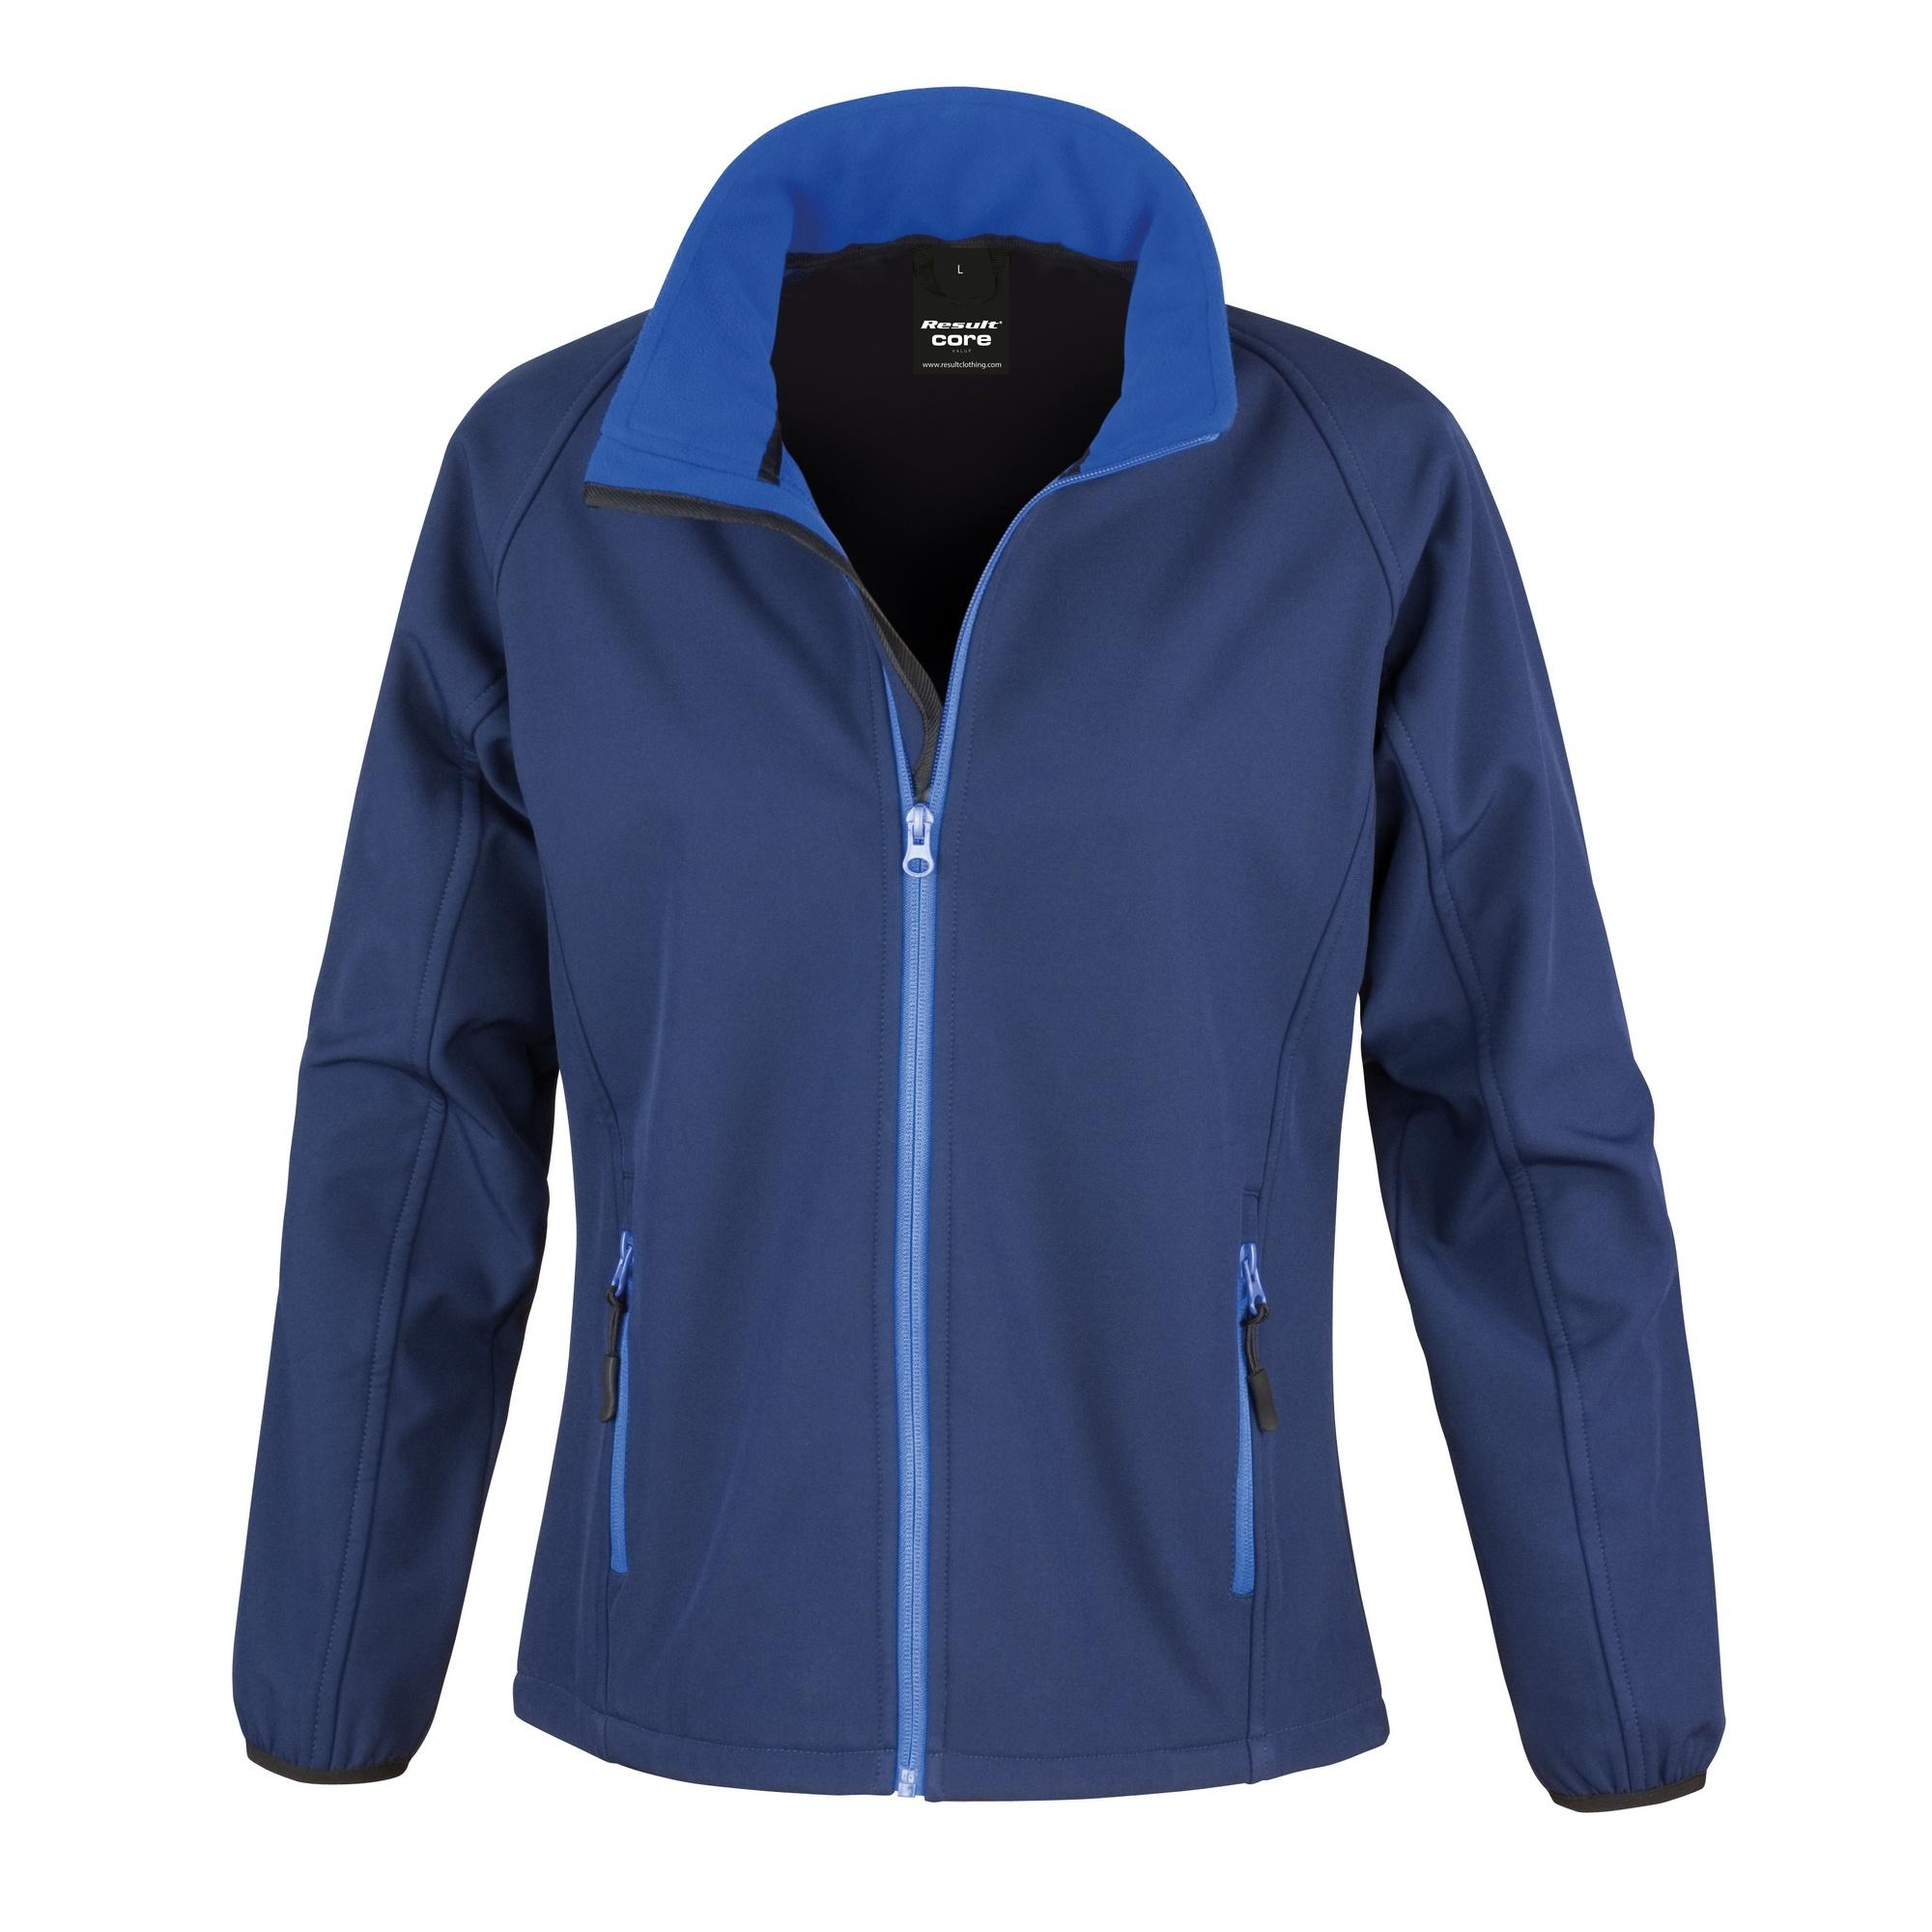 Result Womens/Ladies Core Printable Softshell Jacket (M) (Navy / Royal)